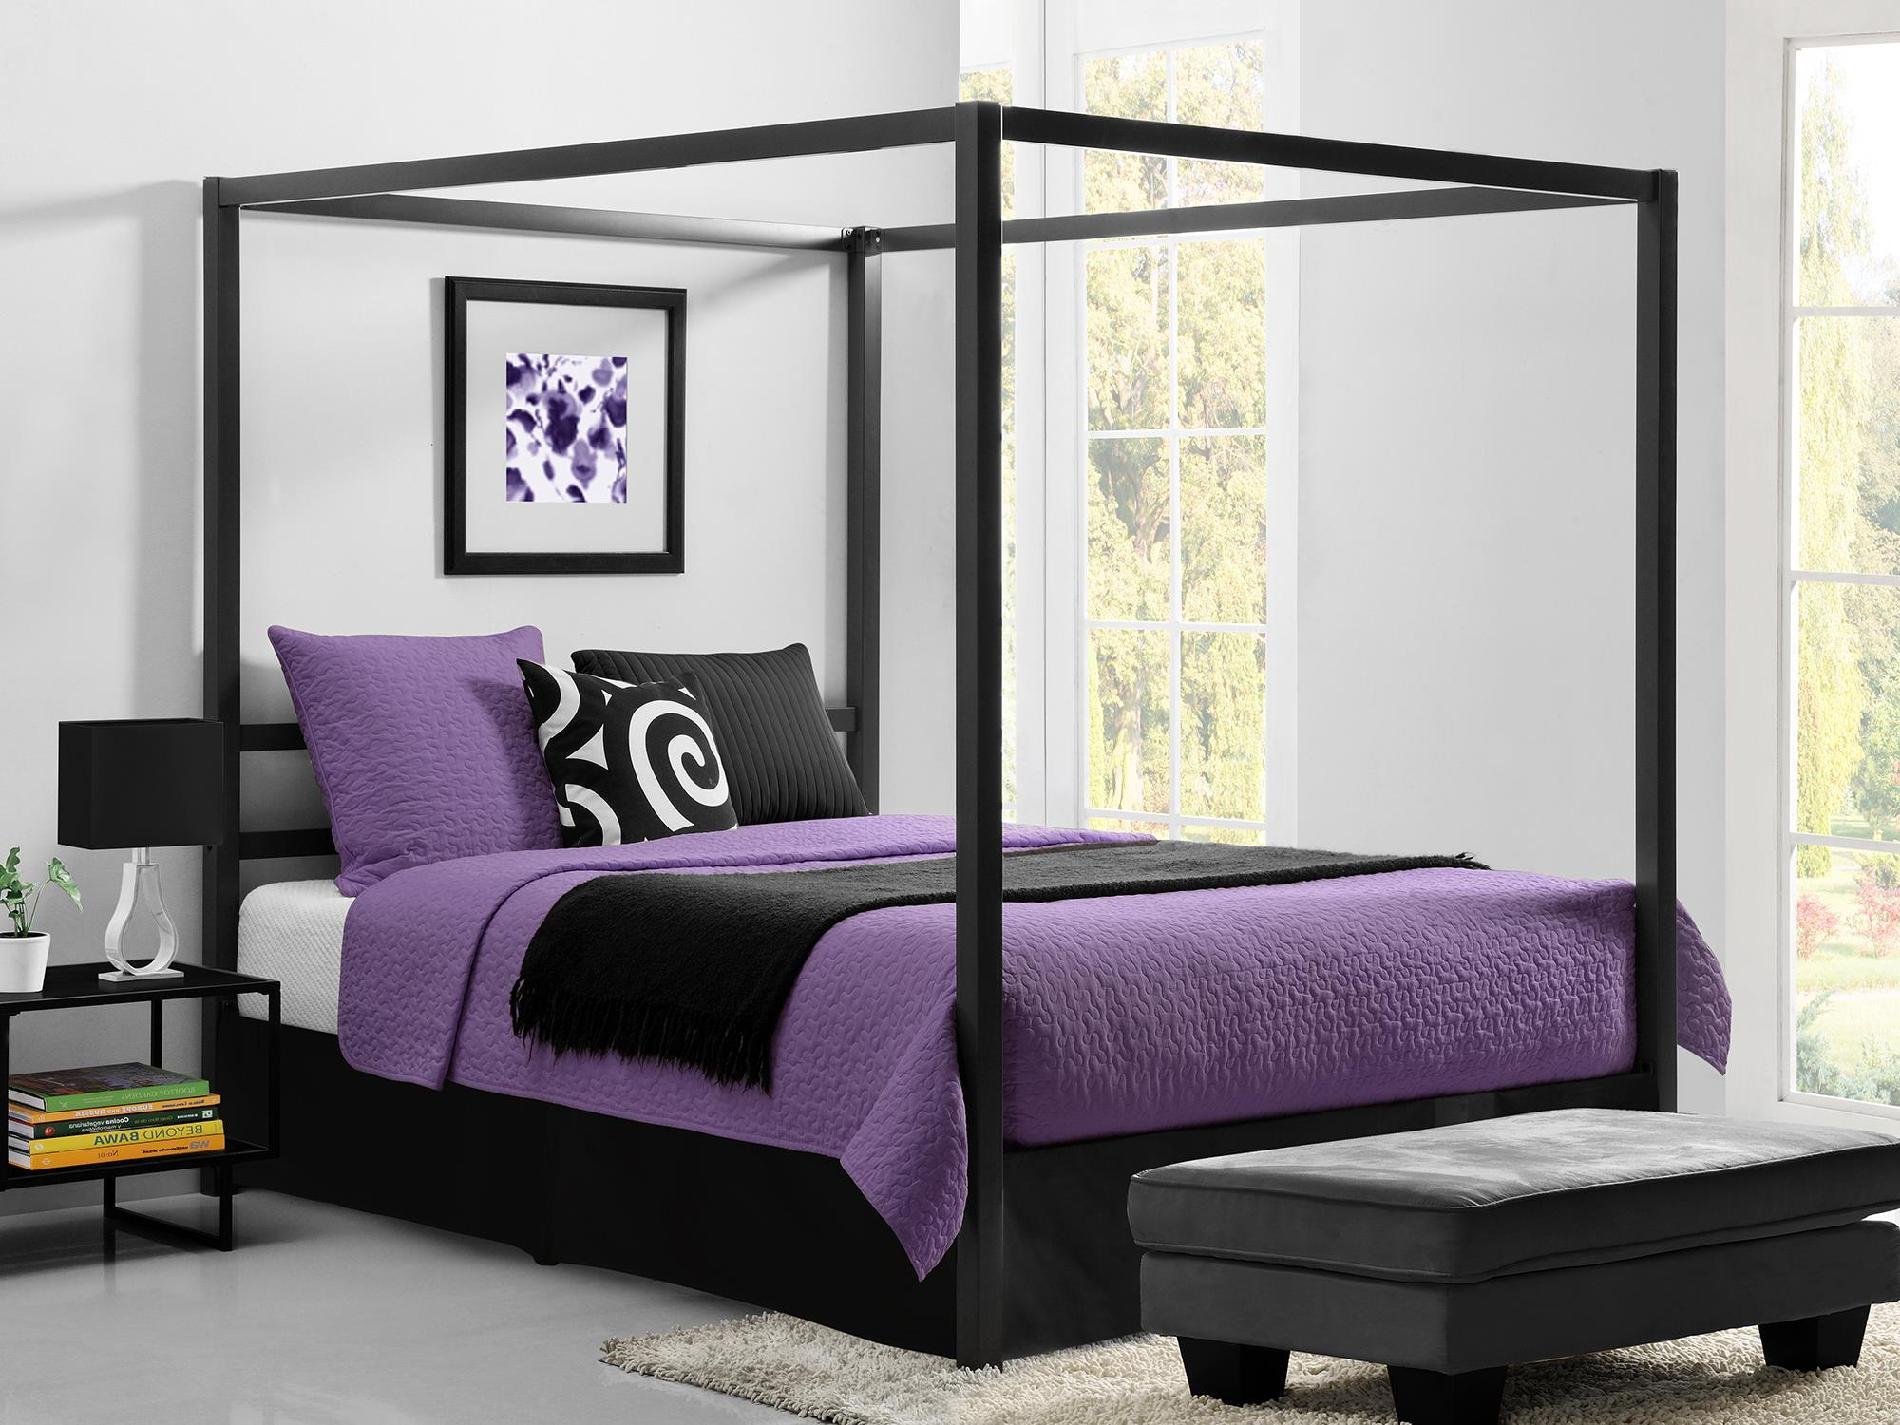 Dorel Home Furnishings Modern Queen Black Canopy Metal Bed